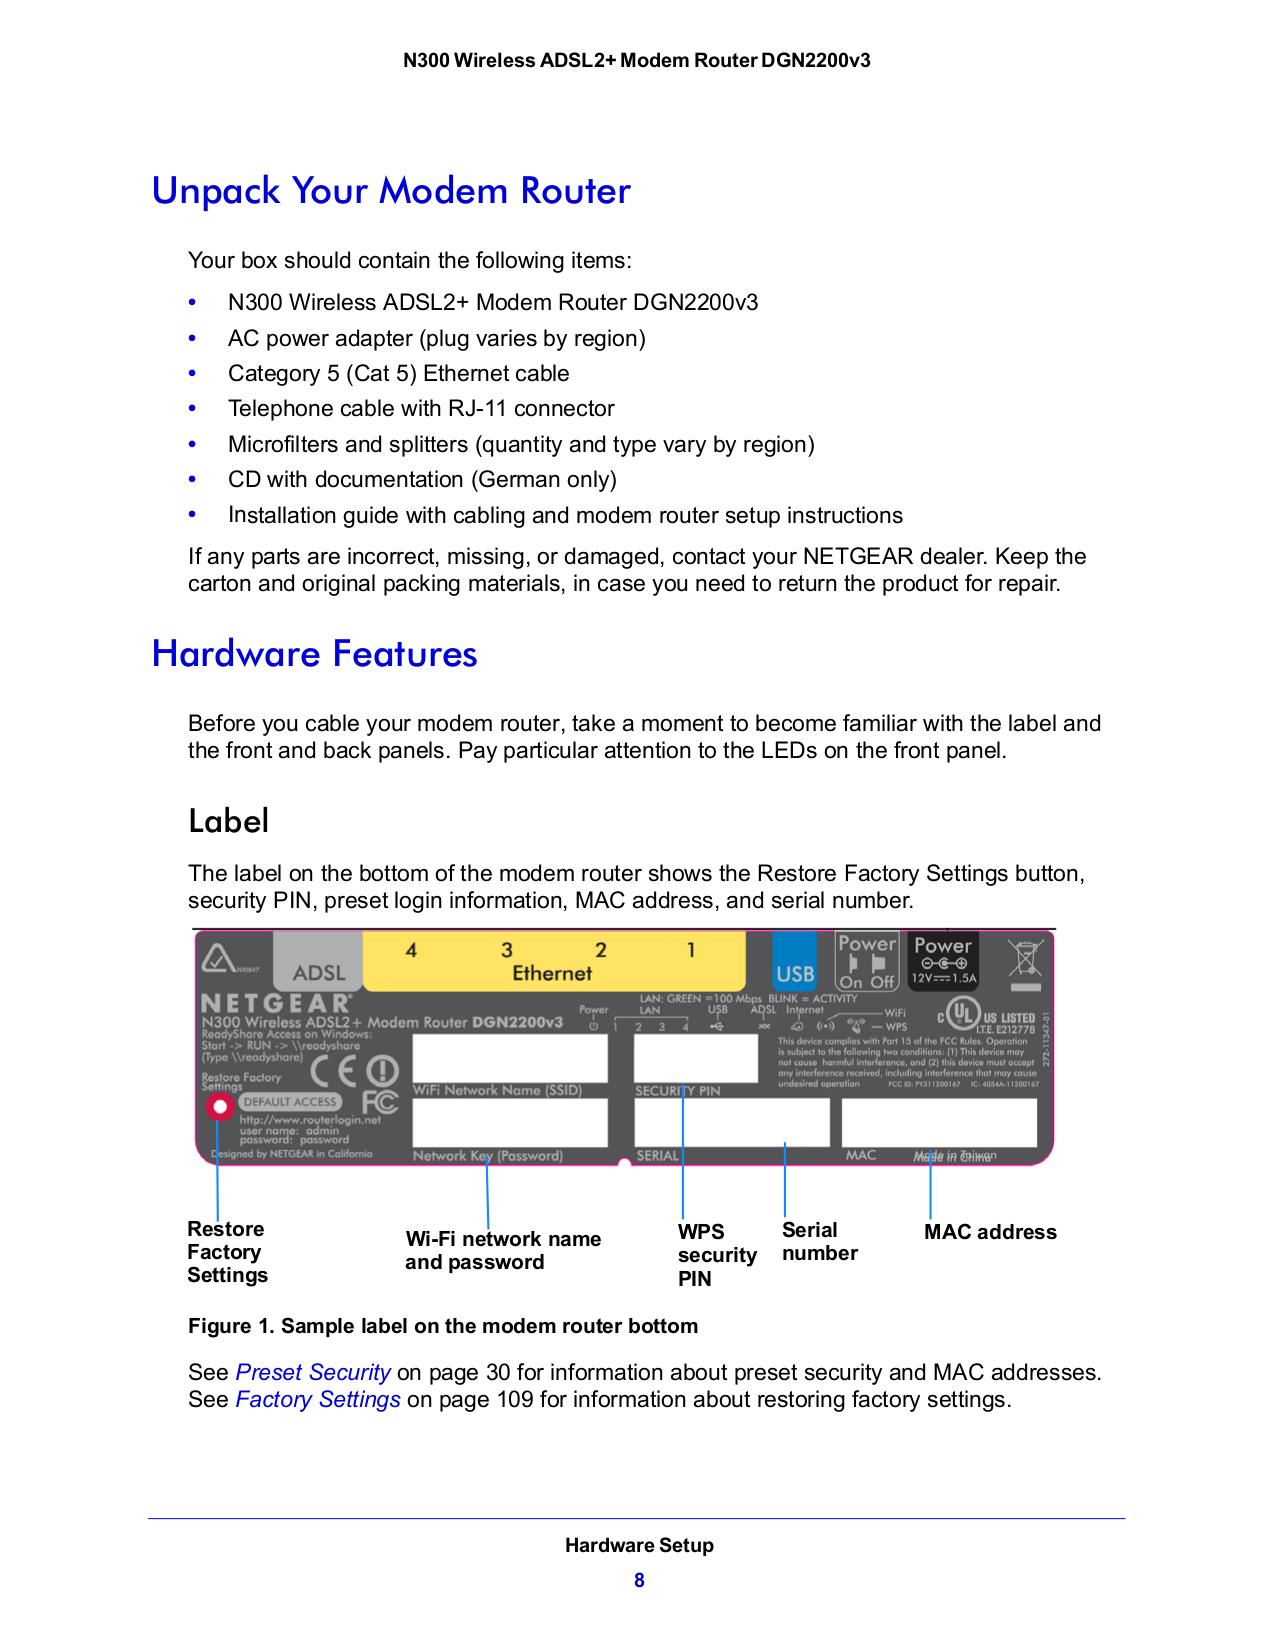 PDF manual for Netgear Wireless Router DGN2200